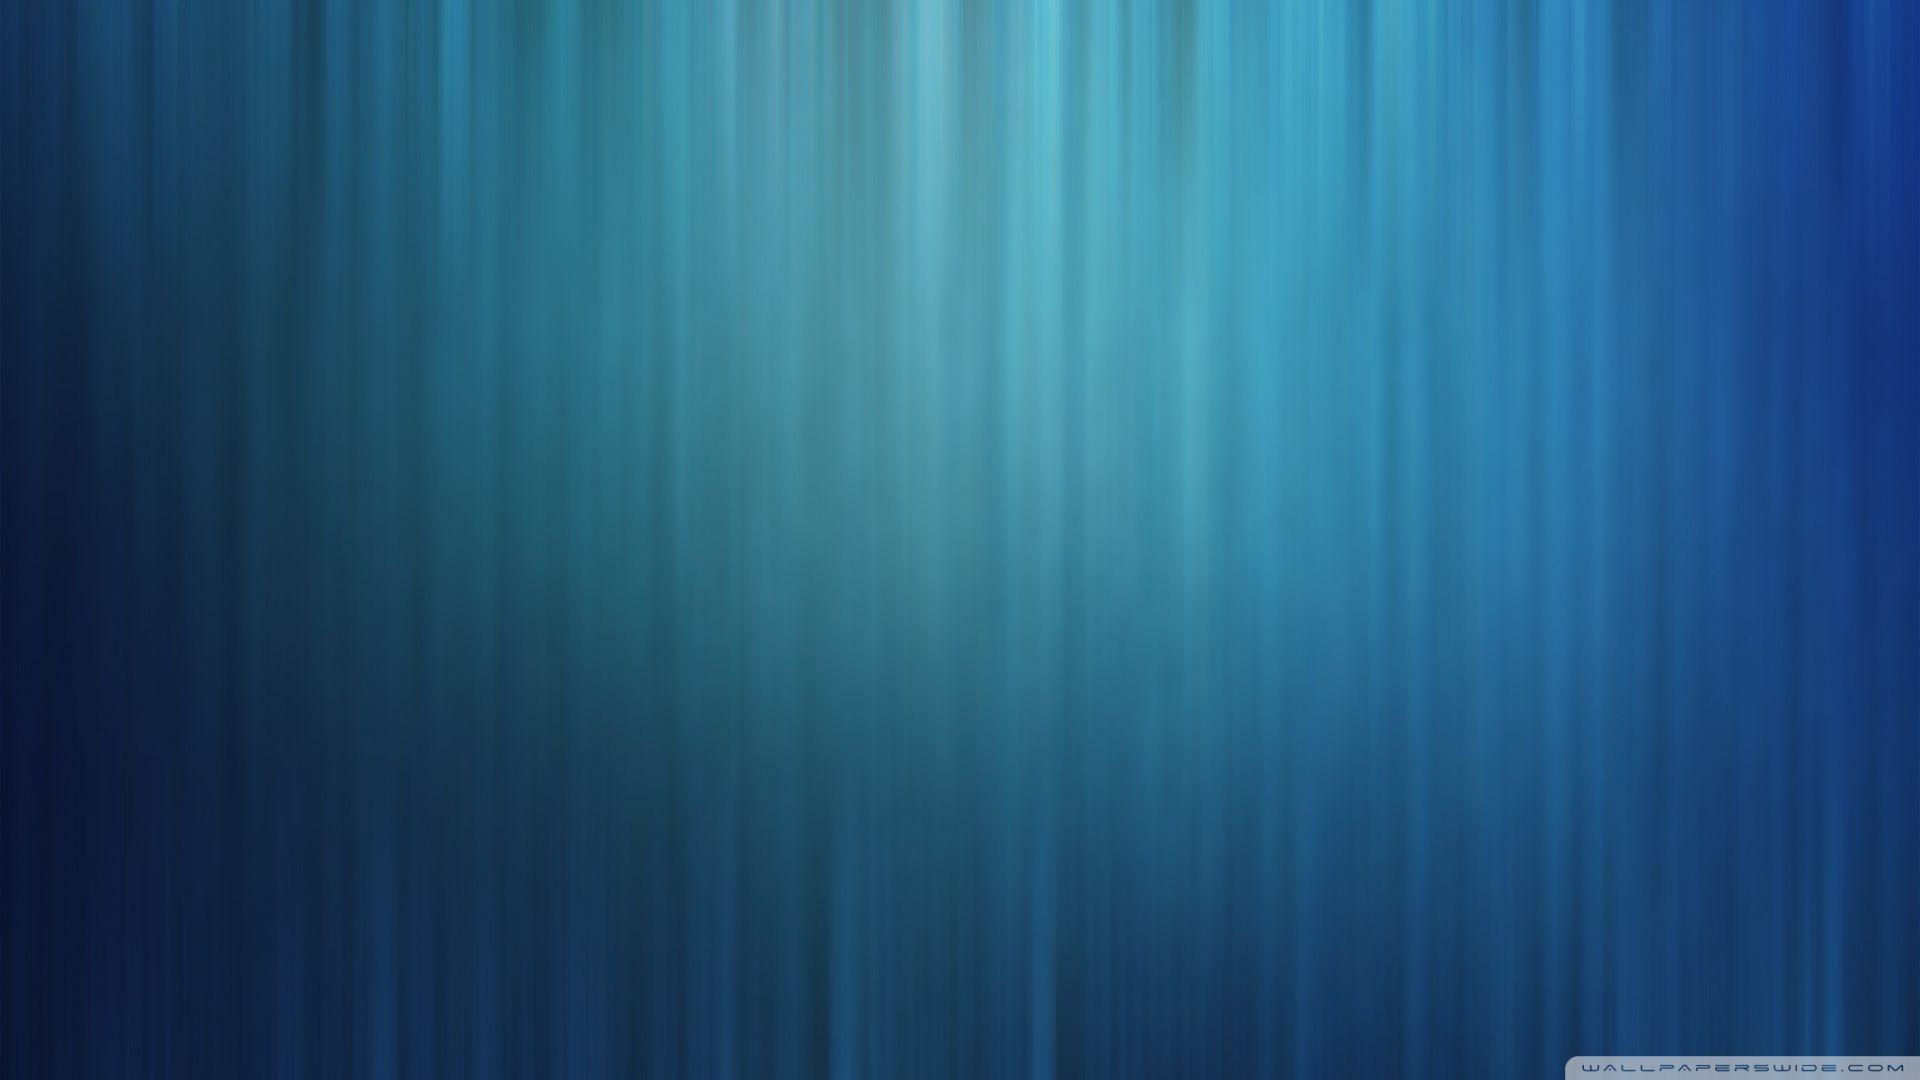 Aero Blue 11 Hd Wide Wallpaper For Widescreen Wallpapers Hd Wallpapers